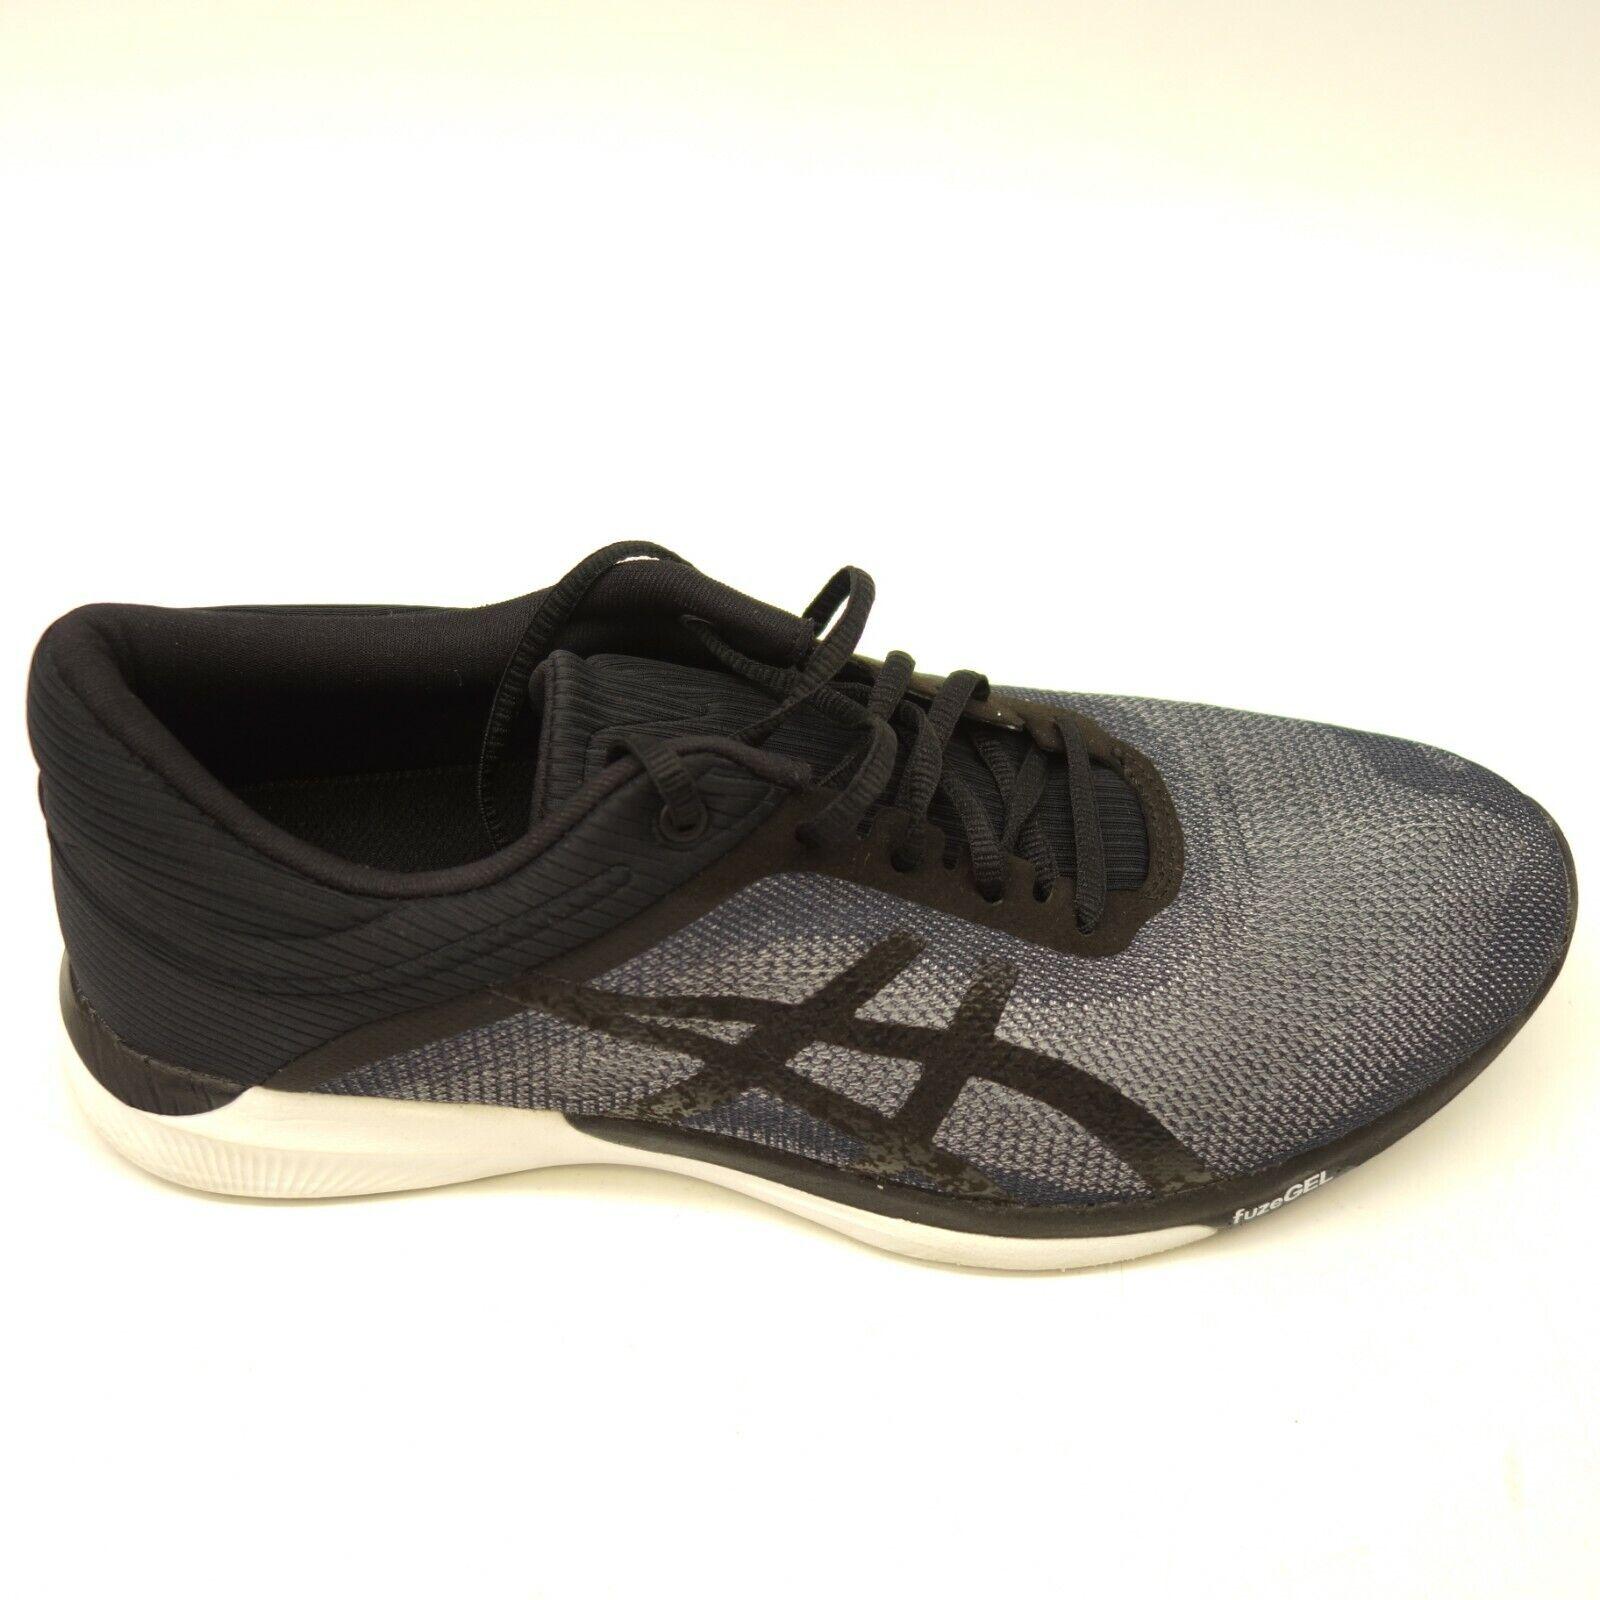 Asics FuzeX Rush Adapt US 8 EU 40 Black Athletic Running Training Womens shoes